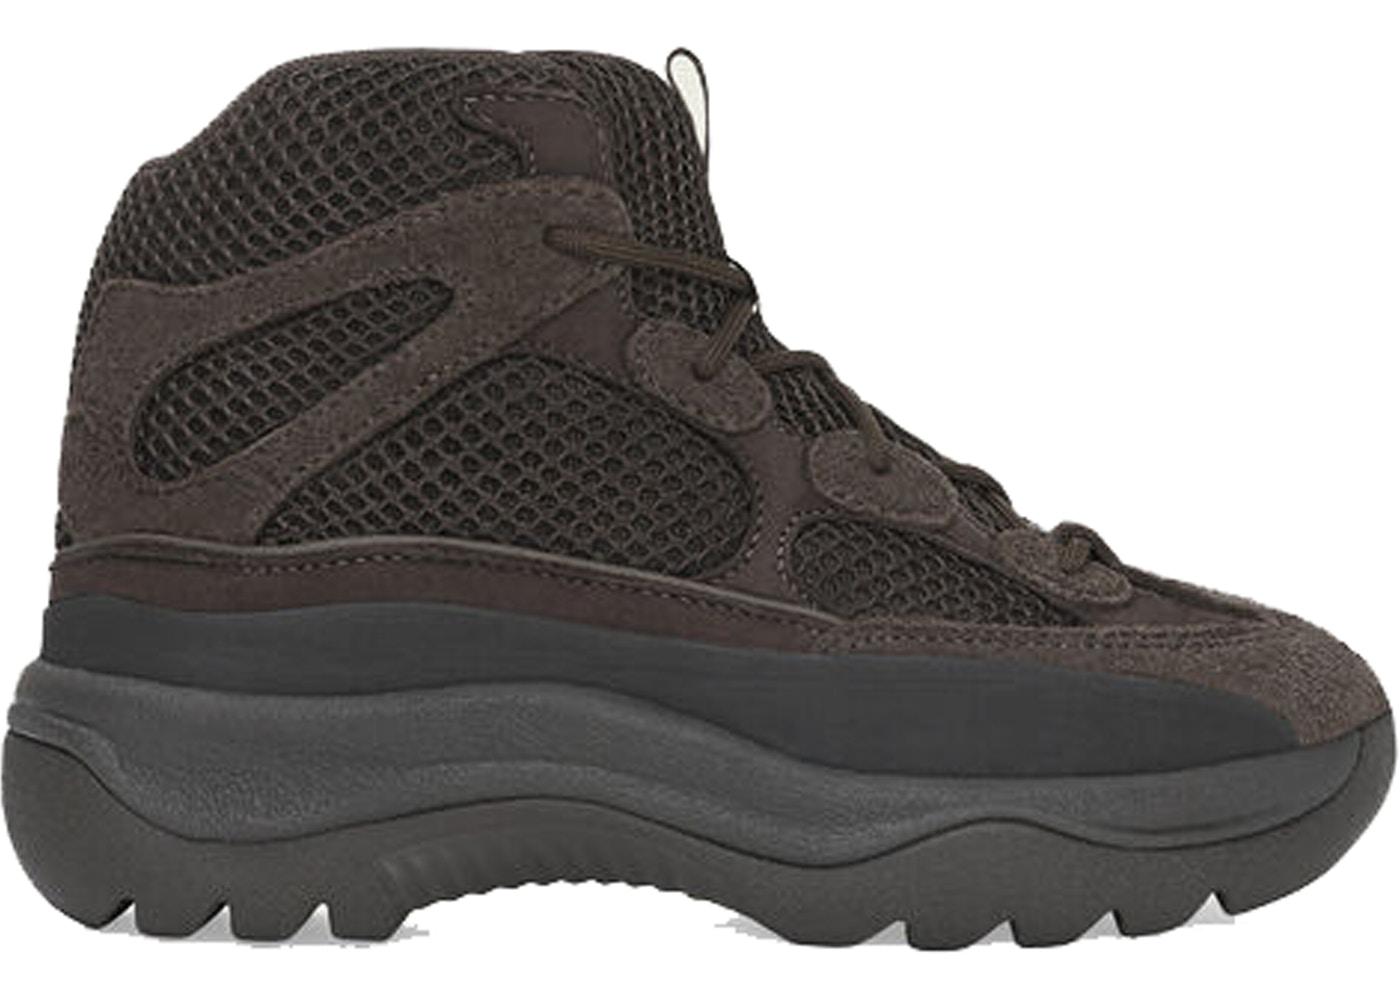 adidas Yeezy Desert Boot Oil (Kids)